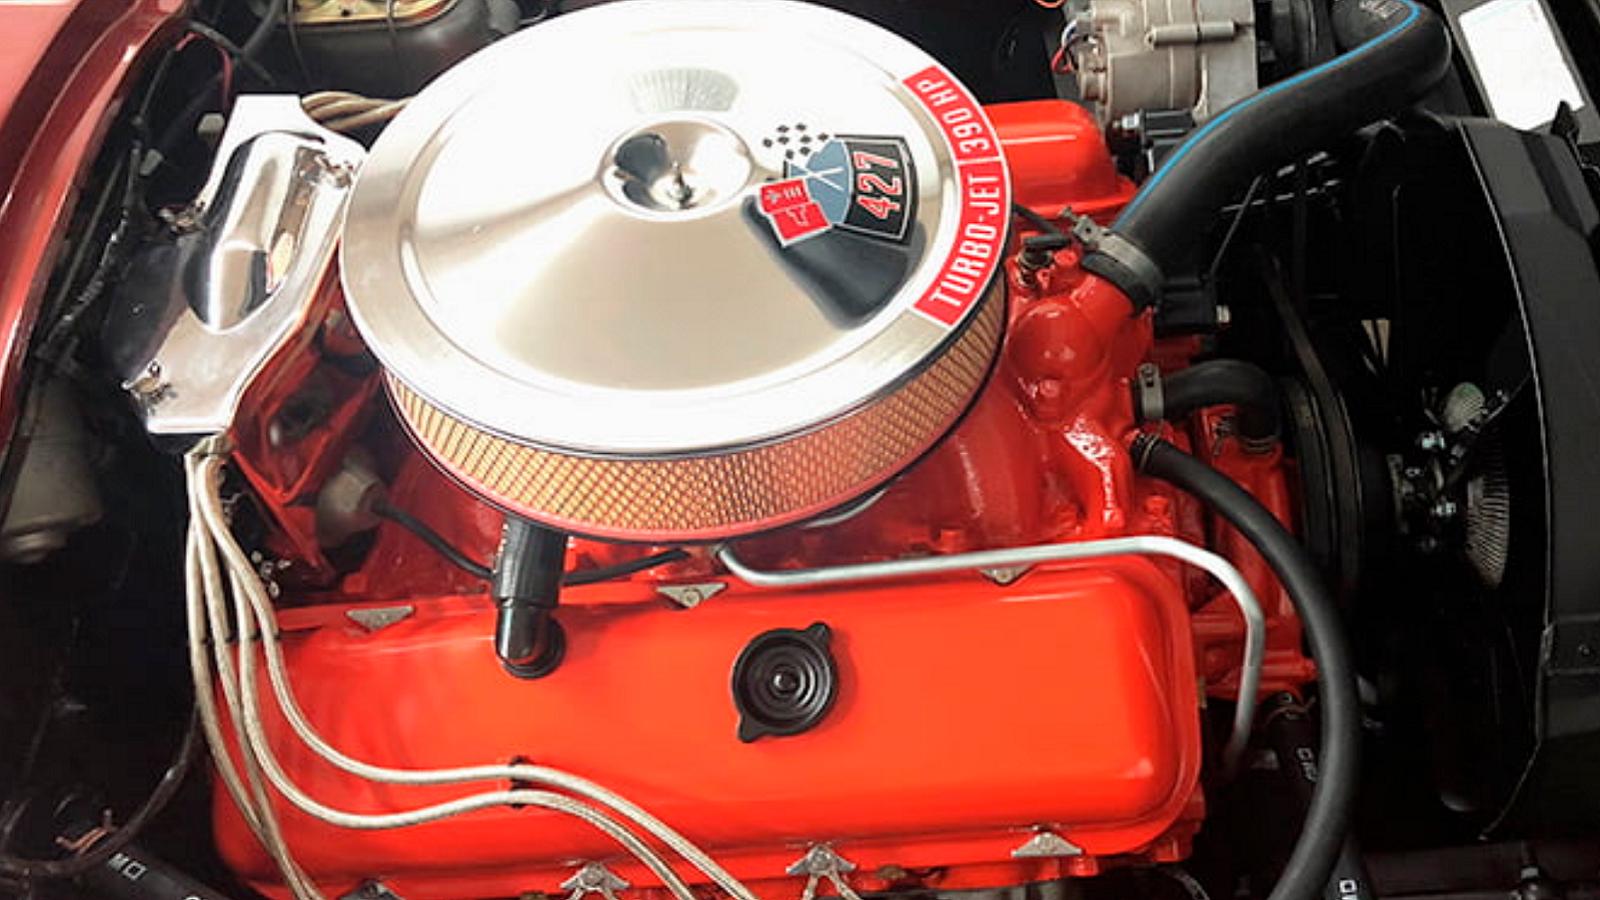 Stunning 1967 Corvette Has Some Tasty Options